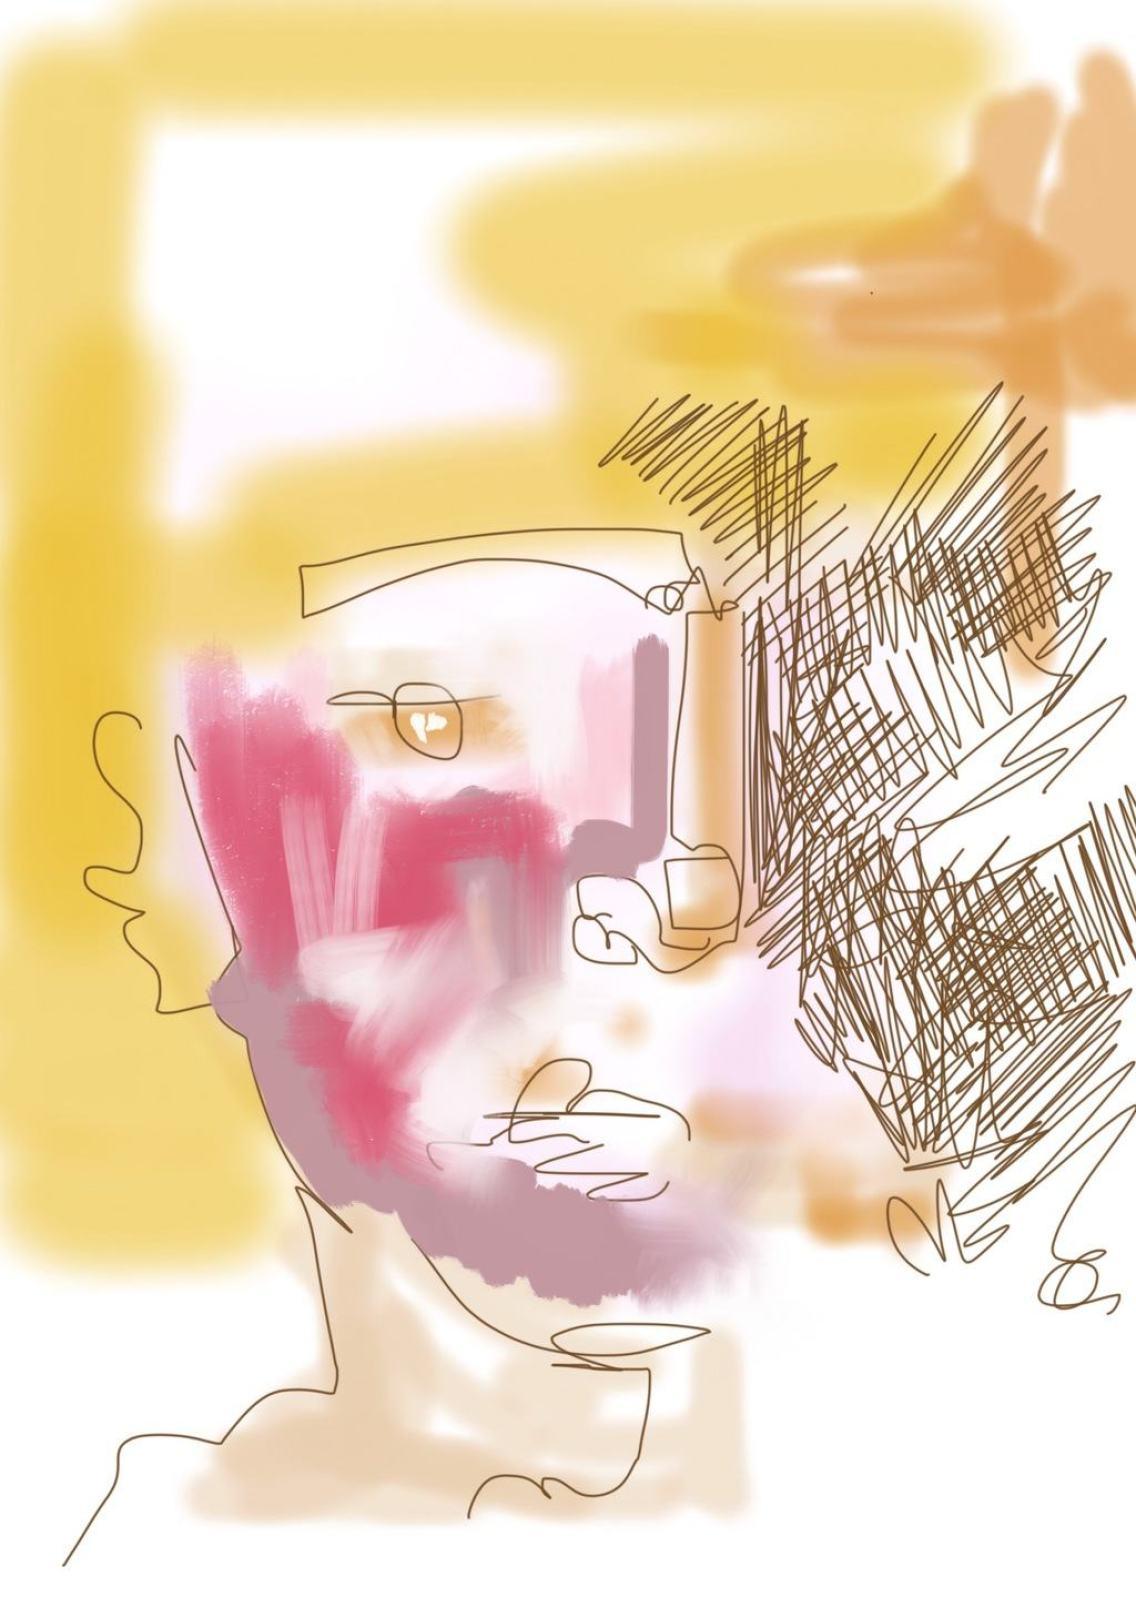 Cachinero_Digital Painting_32